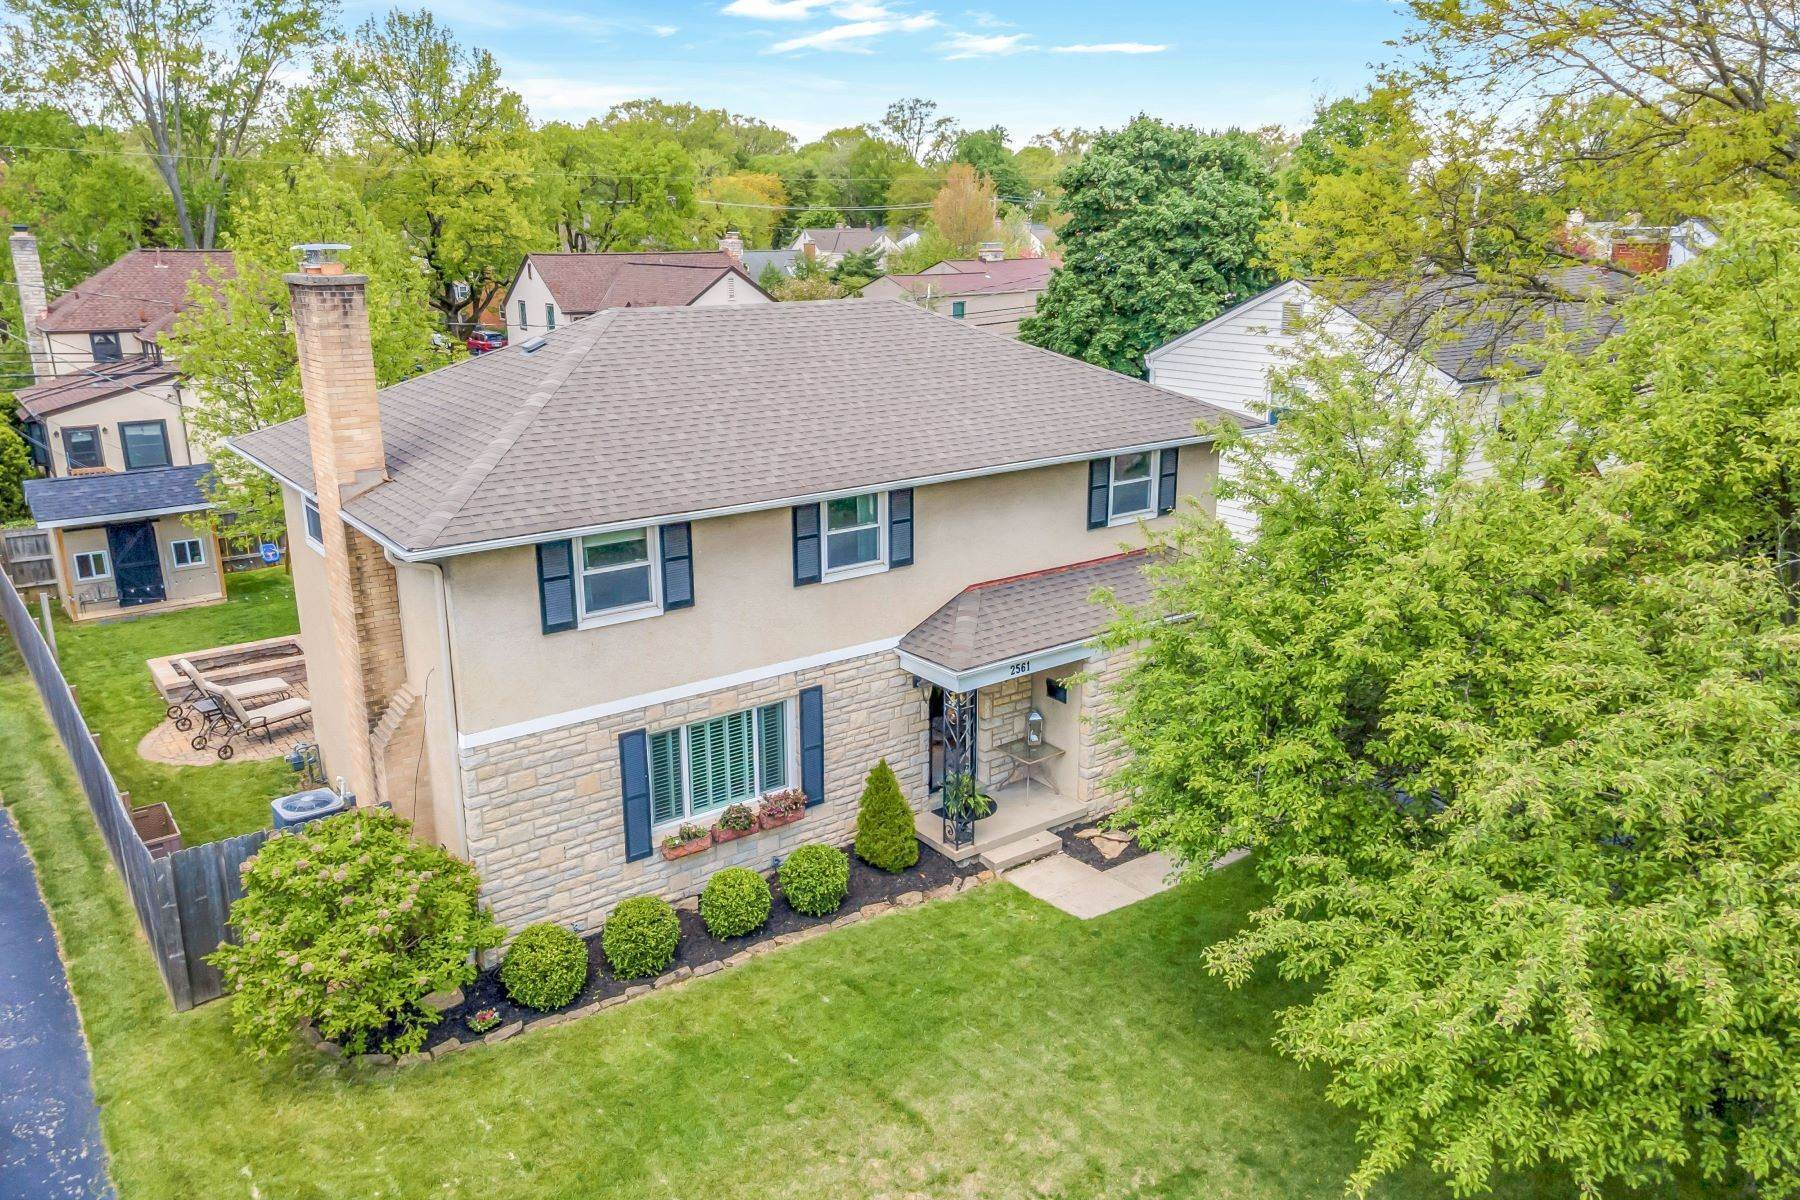 Single Family Homes for Sale at 2561 Northwest Boulevard Upper Arlington, Ohio 43221 United States